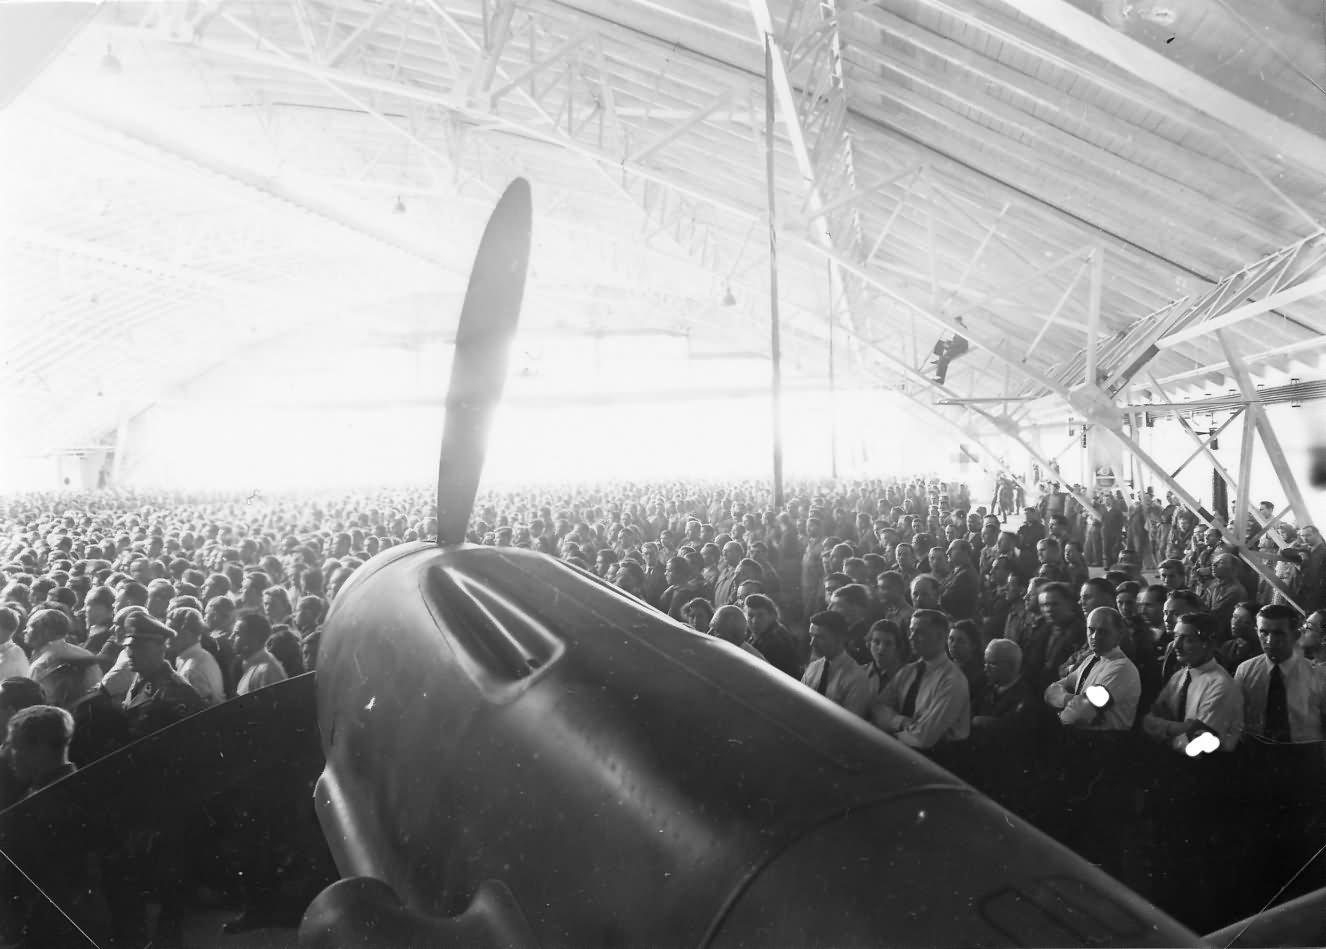 Messerschmitt Bf 109 Wiener Neustadter Flugzeugwerke 145